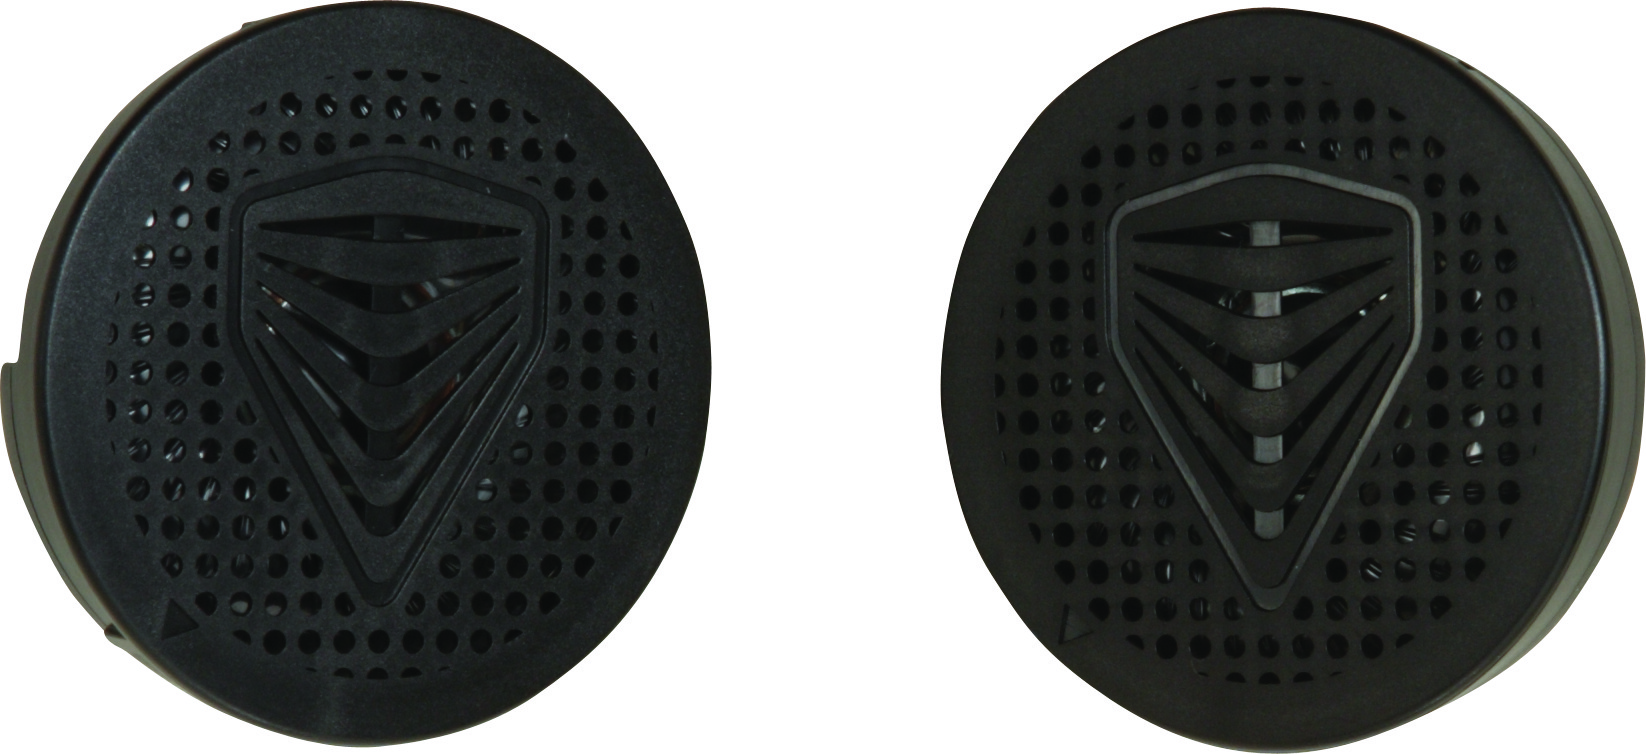 Słuchawki R.e.d. Redphones Djpremium (Black)